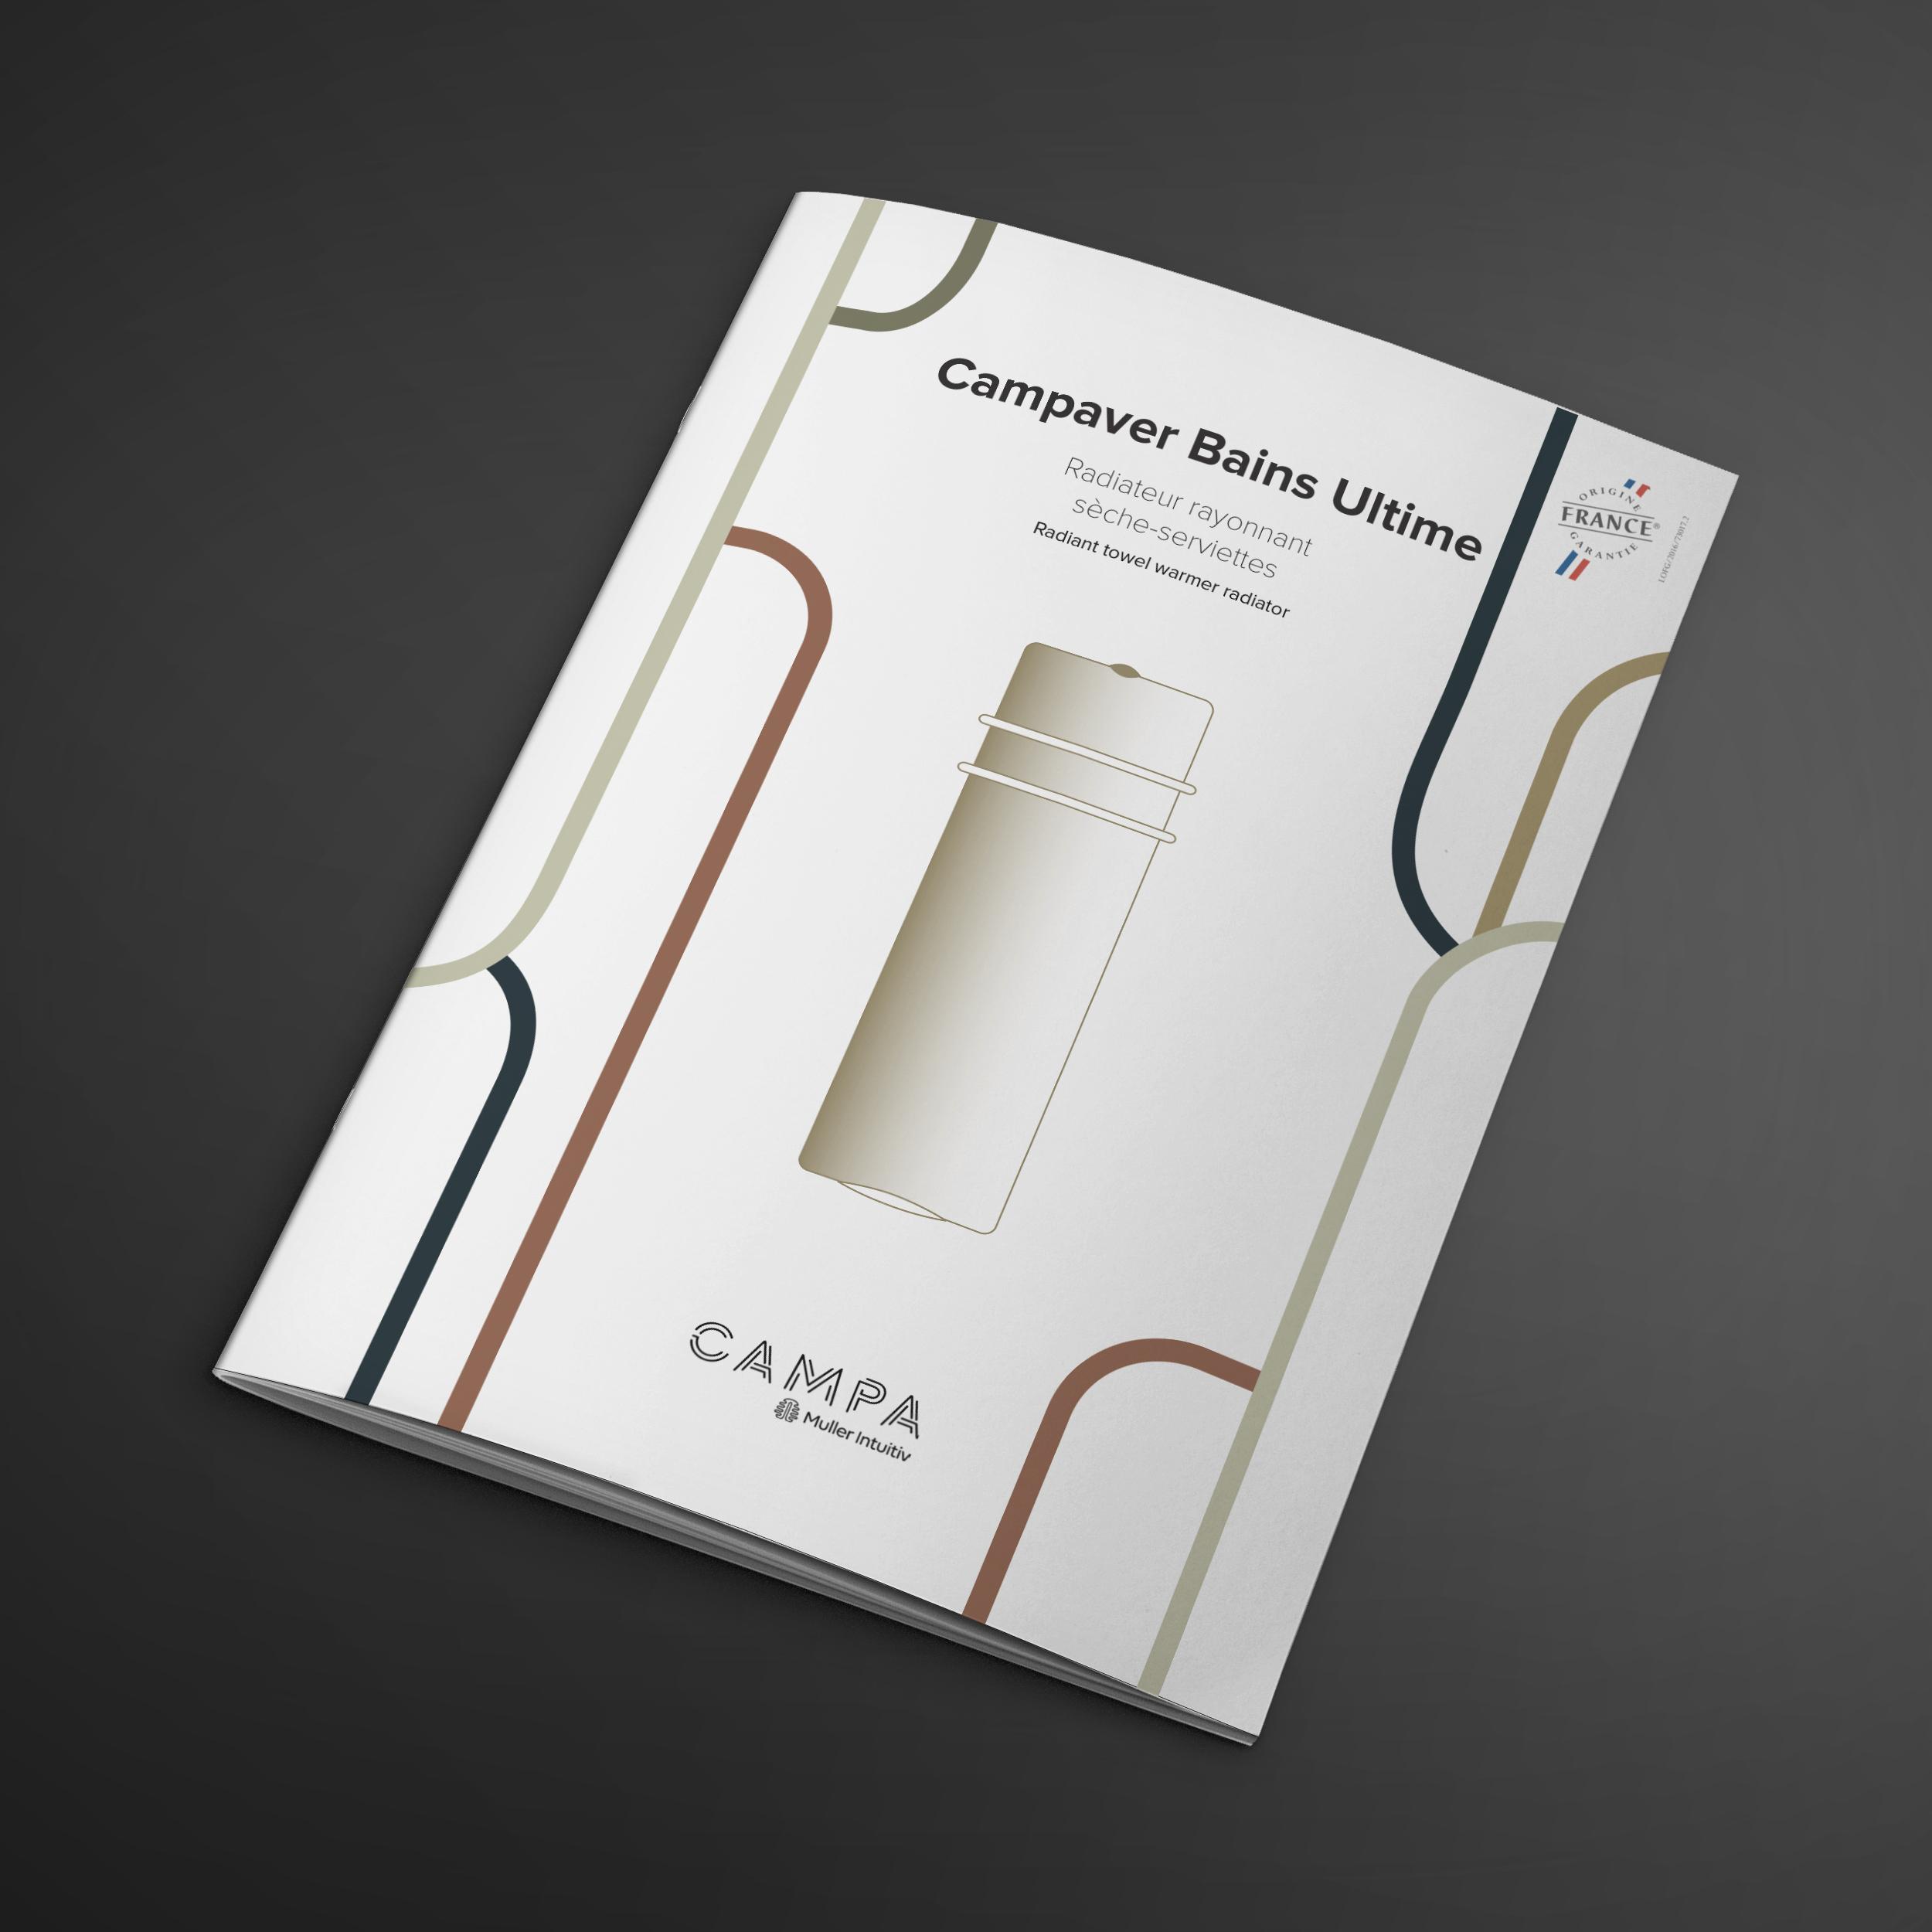 CAMPAVER BAINS ULTIME 3.0